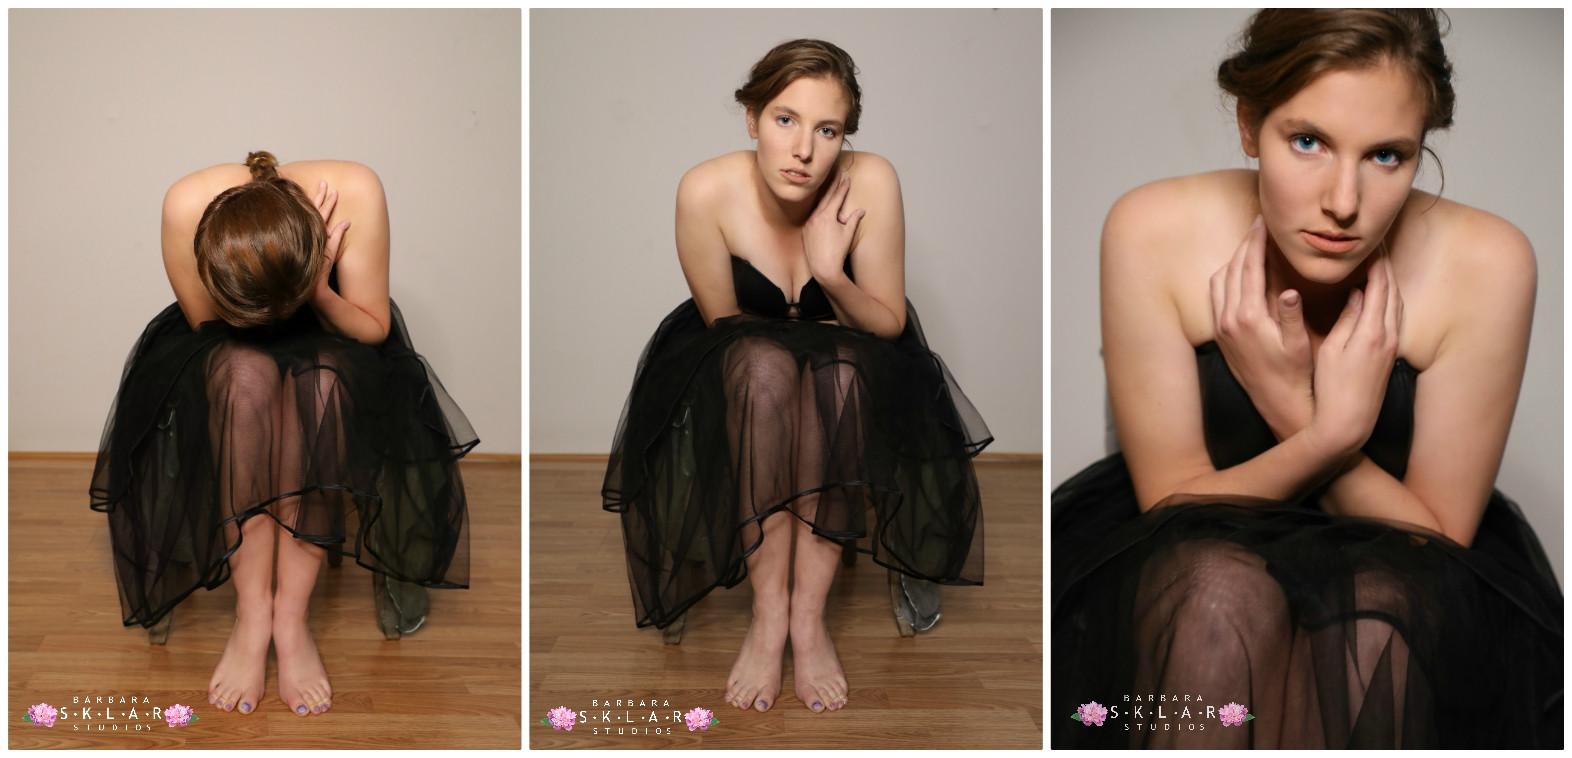 BarbaraSklar_dani_pretty_ballet.jpg